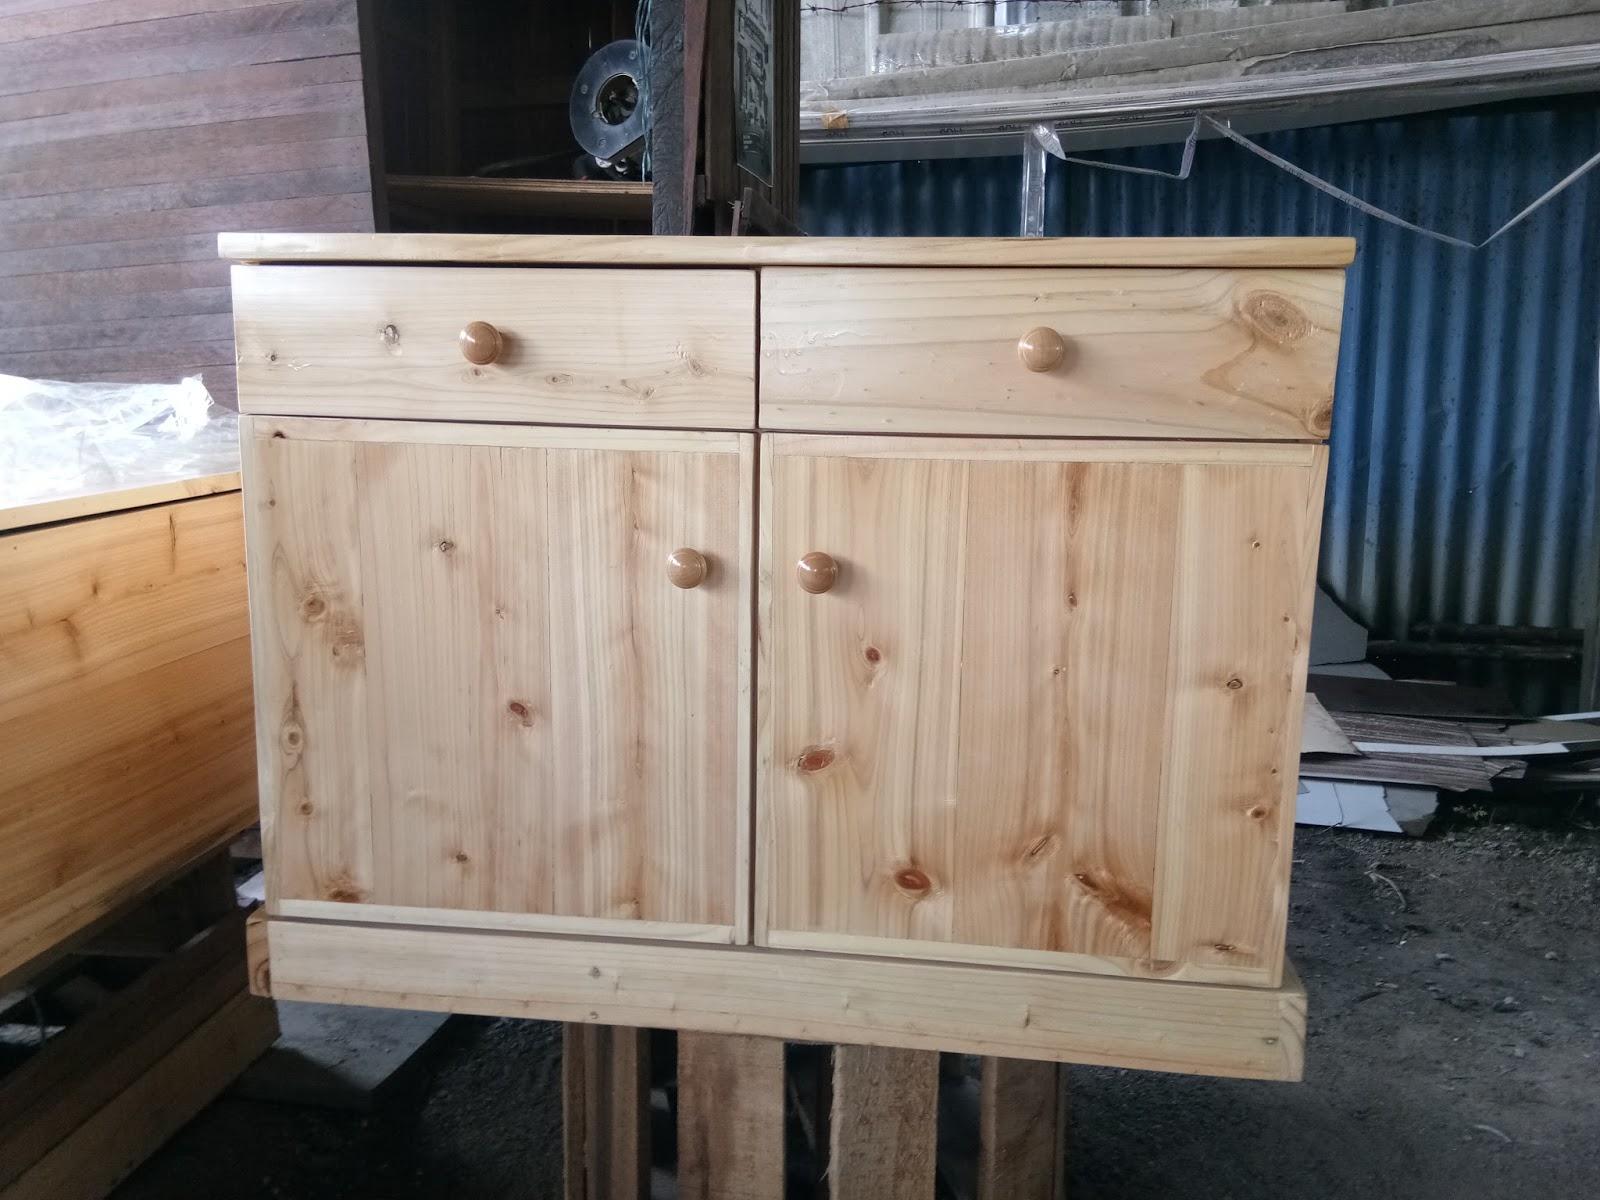 wood furniture pics. Lemari Dispenser Jenis Surfuce Wood Furniture Pics